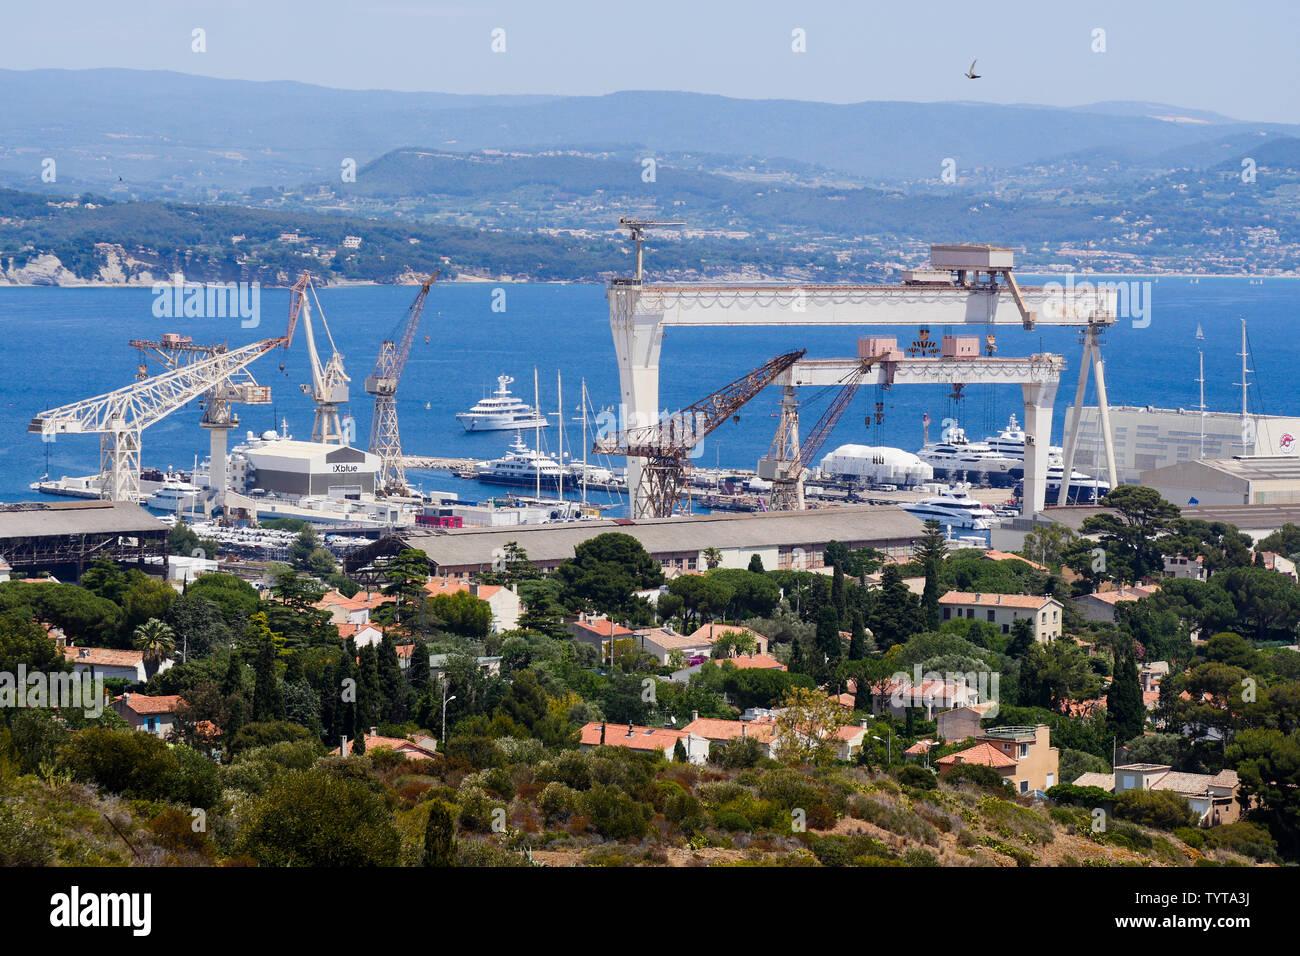 La Ciotat shipyard, La Ciotat, Bouches-du-Rhône, France - Stock Image